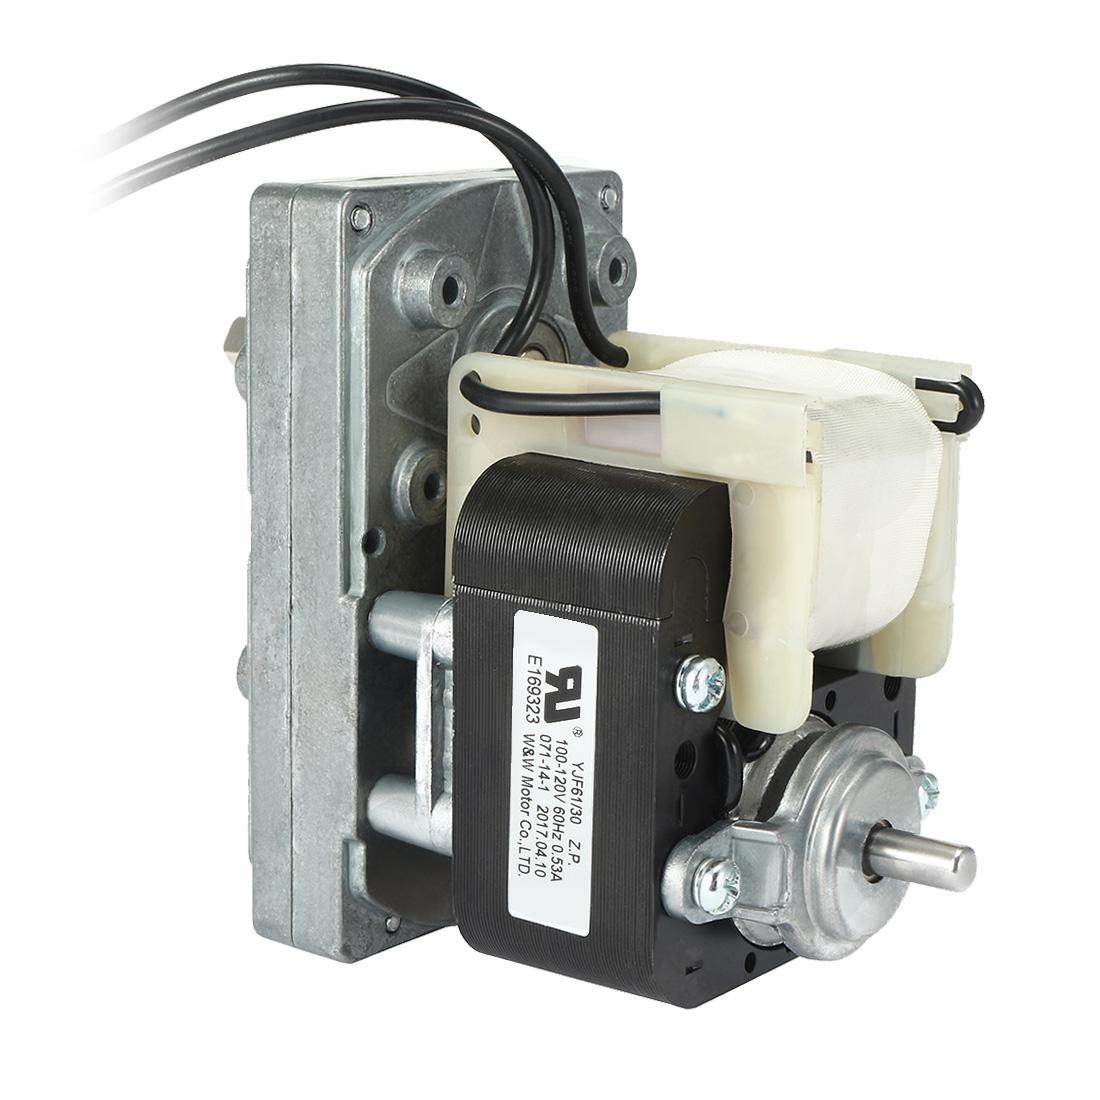 FC-YJ61 AC100V-120V 60Hz 41RPM CW Shaded Pole Motor Universal Geared Motor